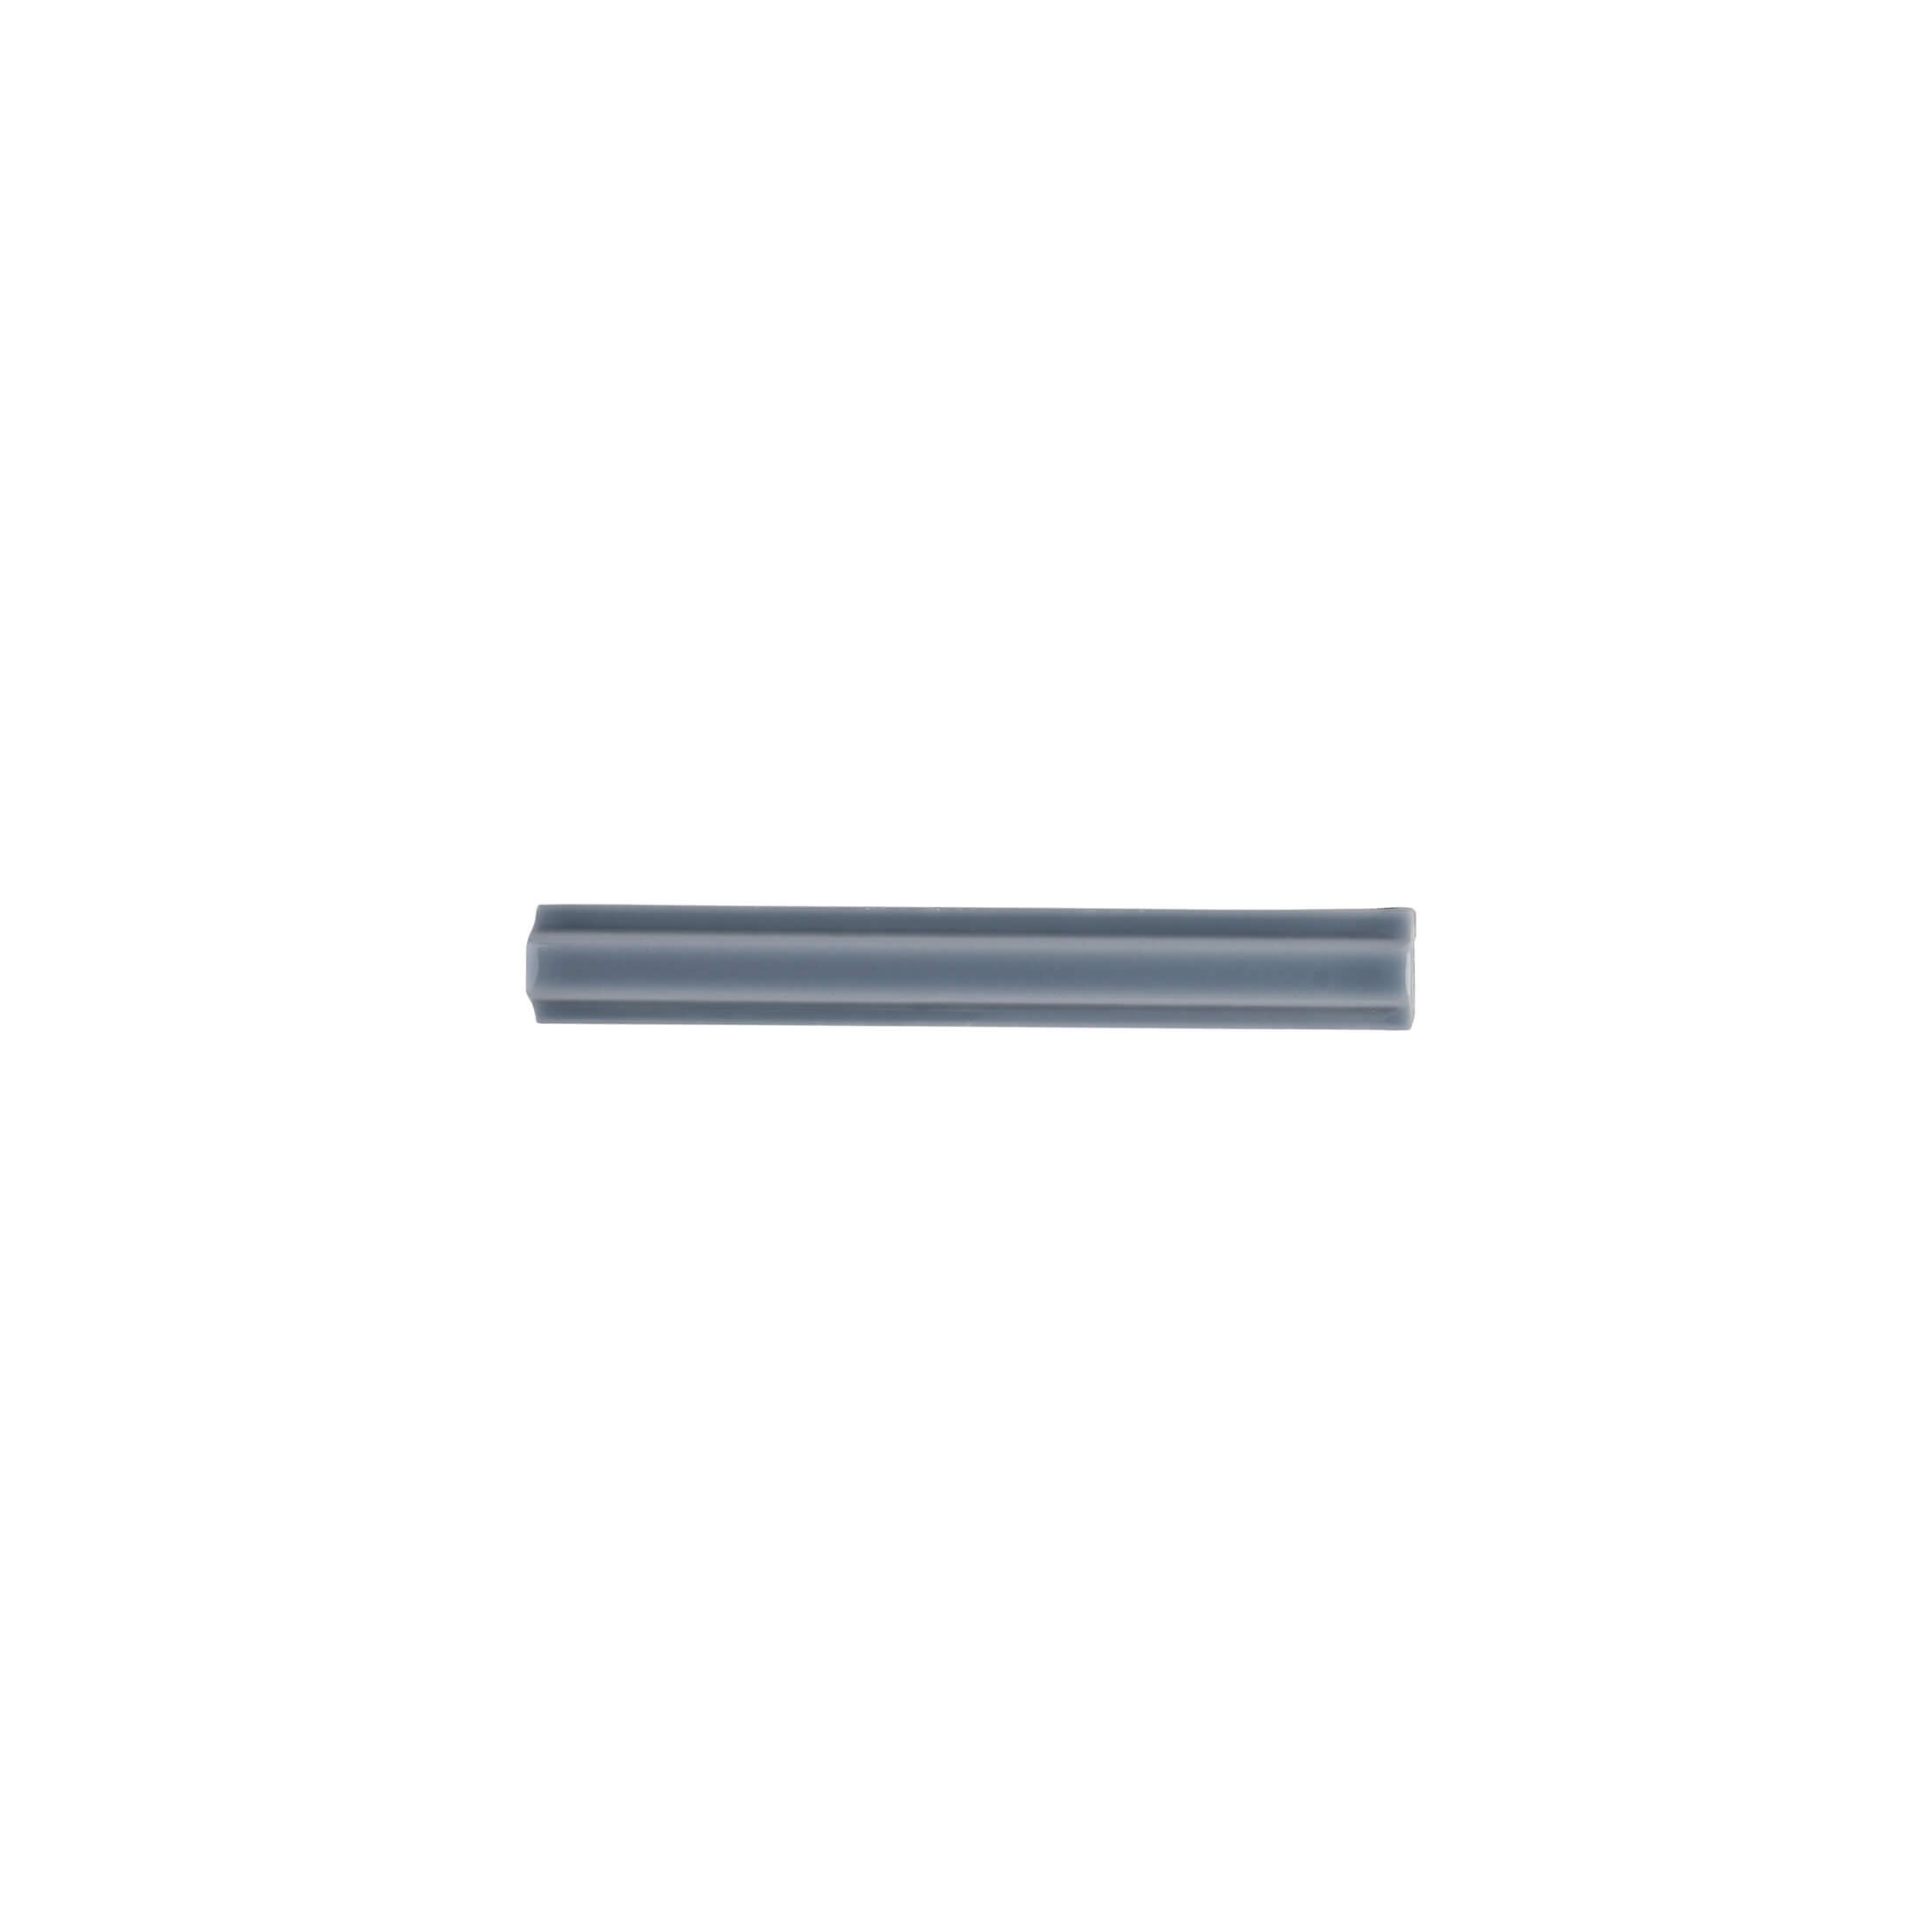 ADNE5595 - LISTELO CLASICO - 1.7 cm X 15 cm